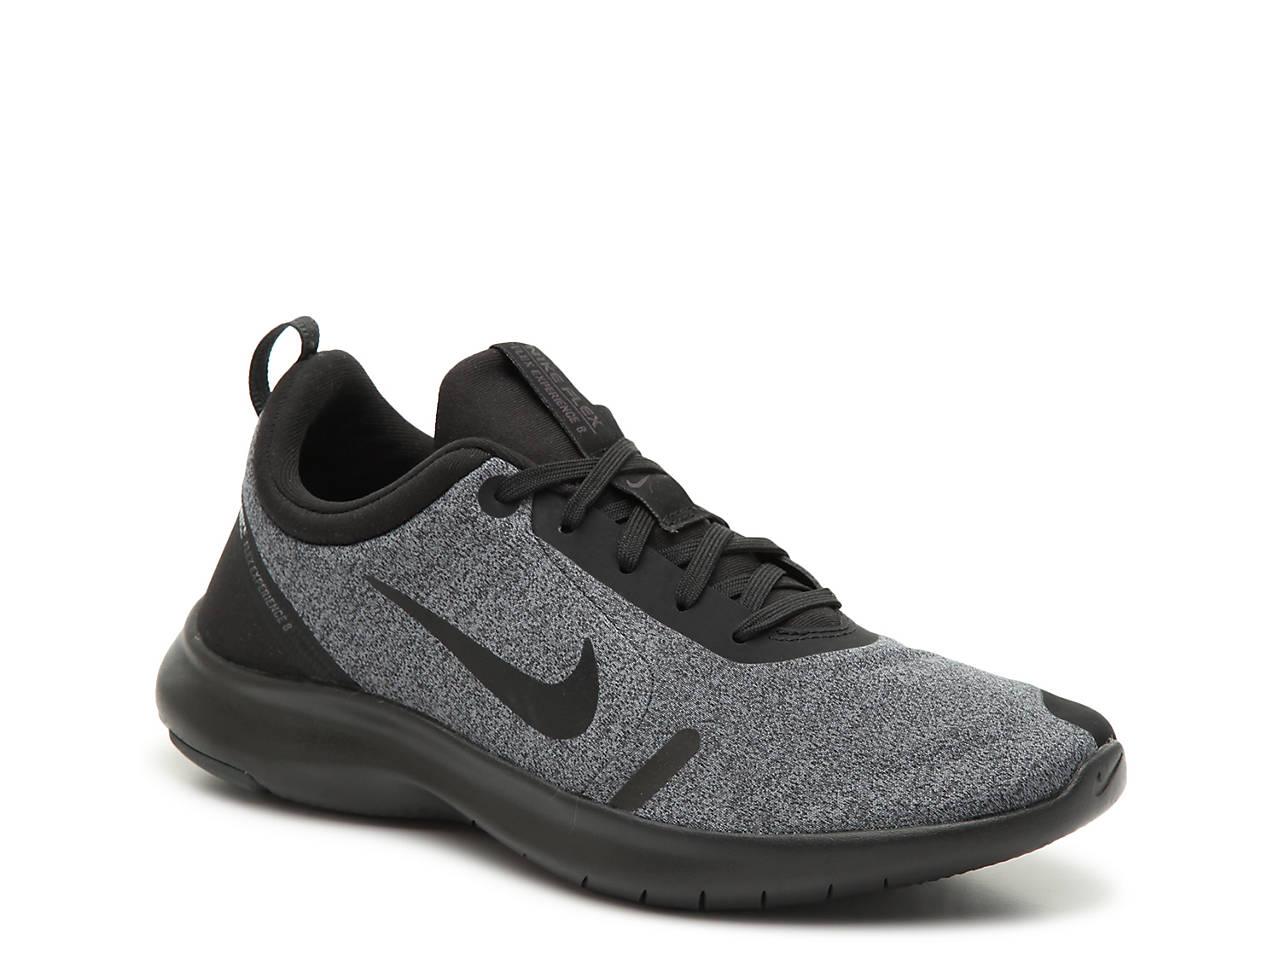 Nike Flex Experience RN 8 Lightweight Running Shoe - Women s Women s ... 587ee27c5